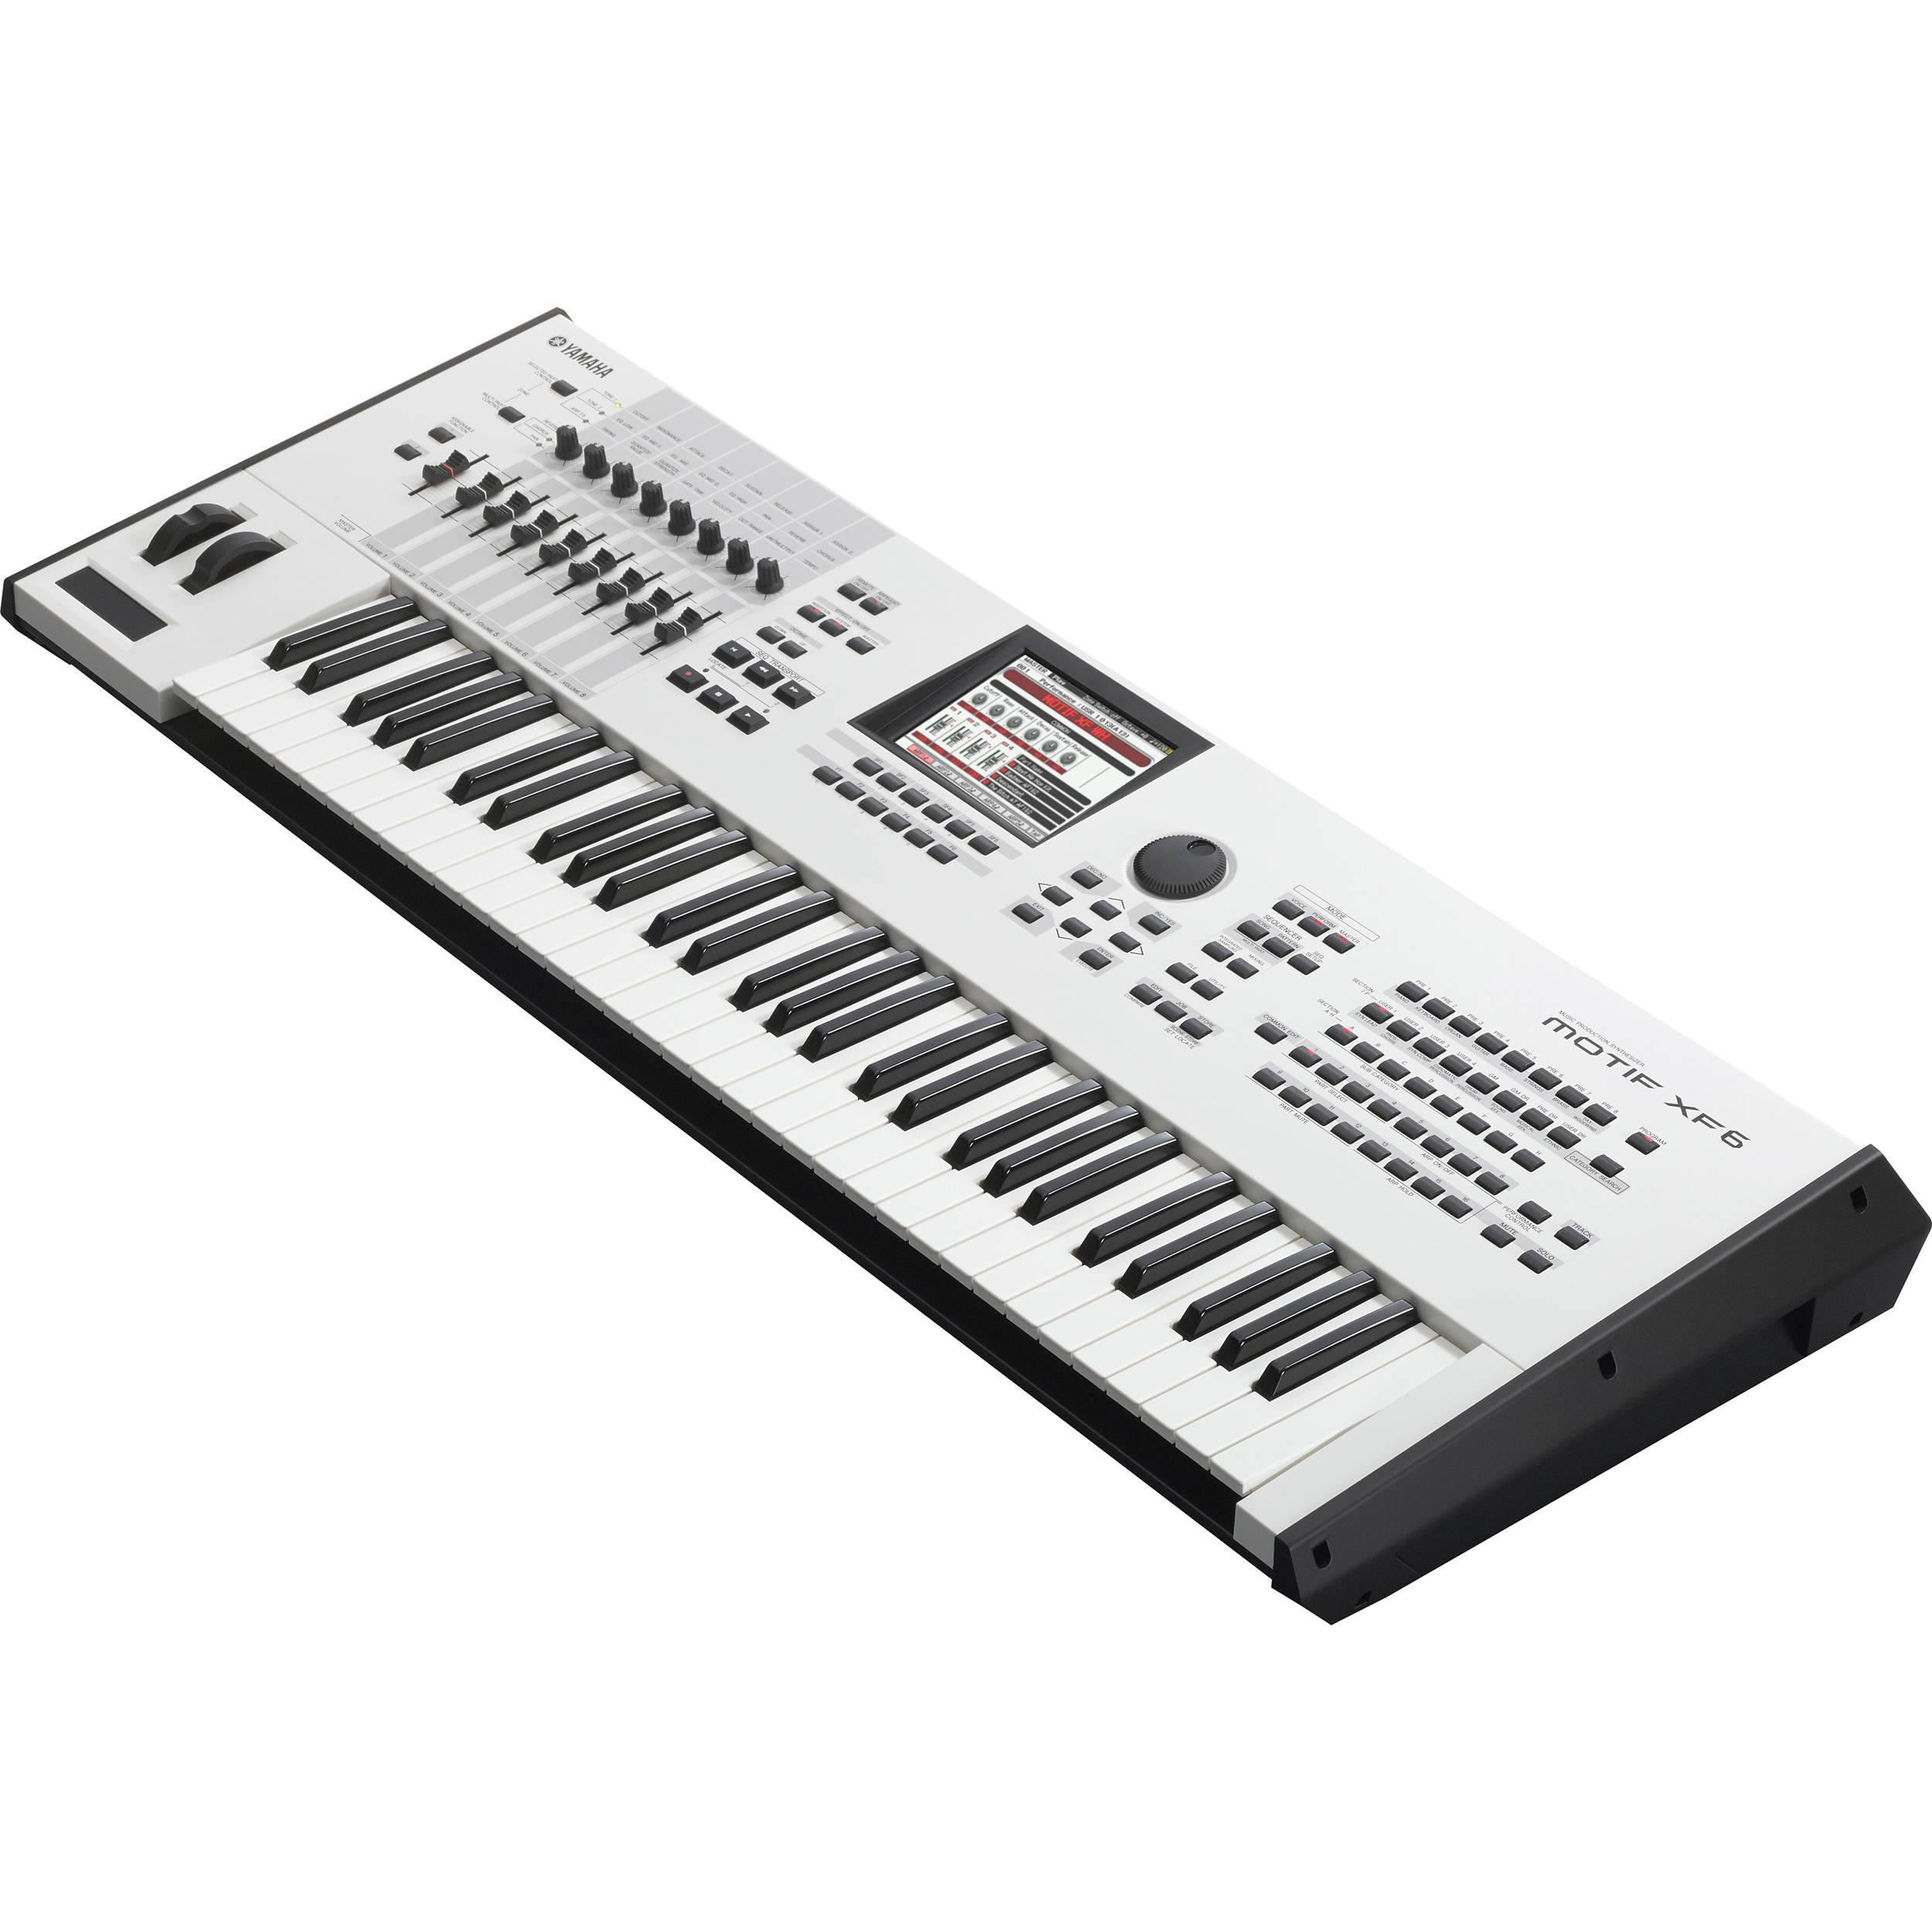 yamaha motif xf6 wh workstation keyboard motifxf6 wh b h photo. Black Bedroom Furniture Sets. Home Design Ideas